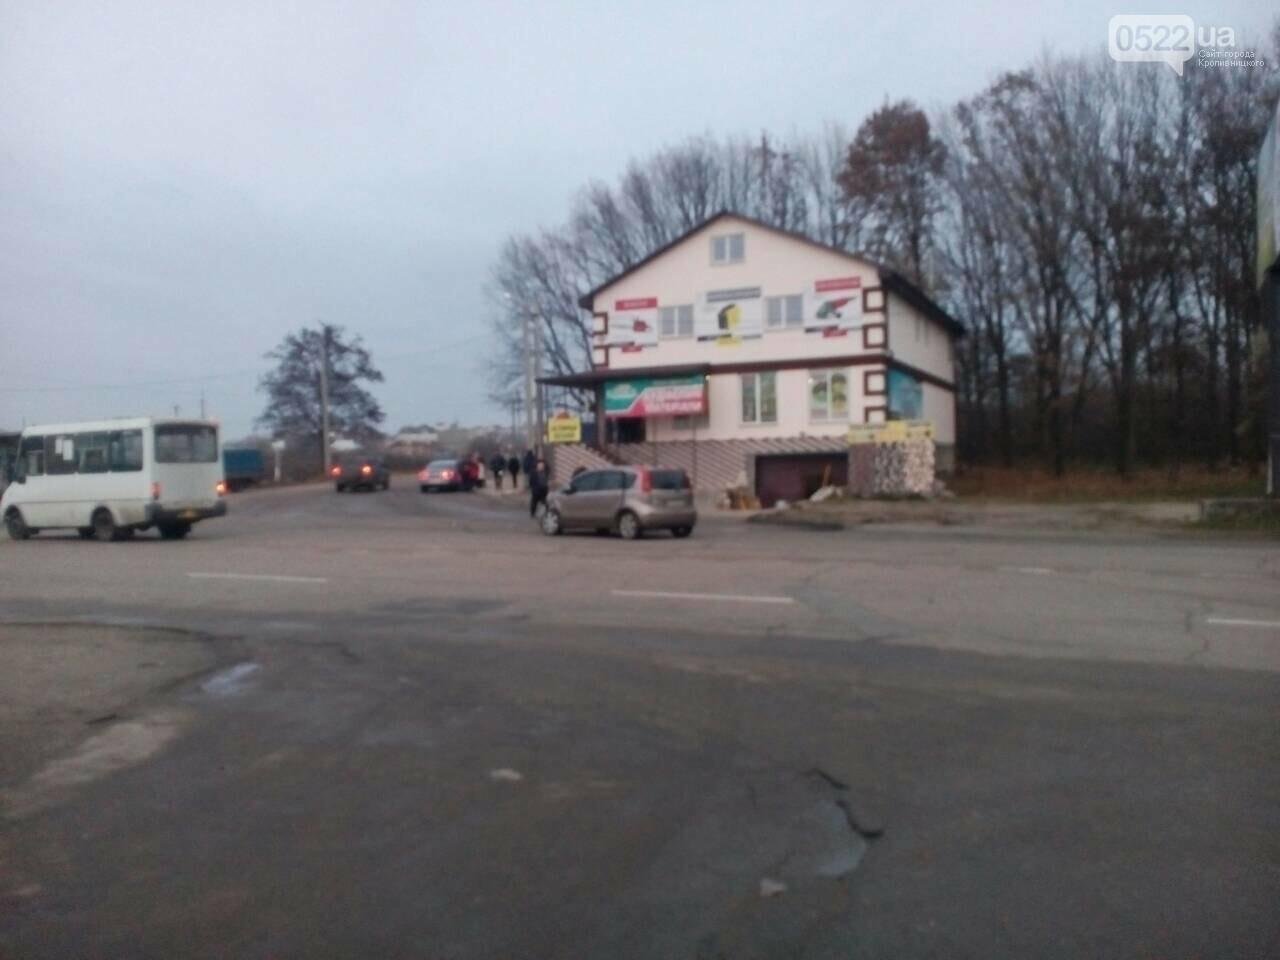 В Лелековке произошло ДТП. ФОТО, фото-1